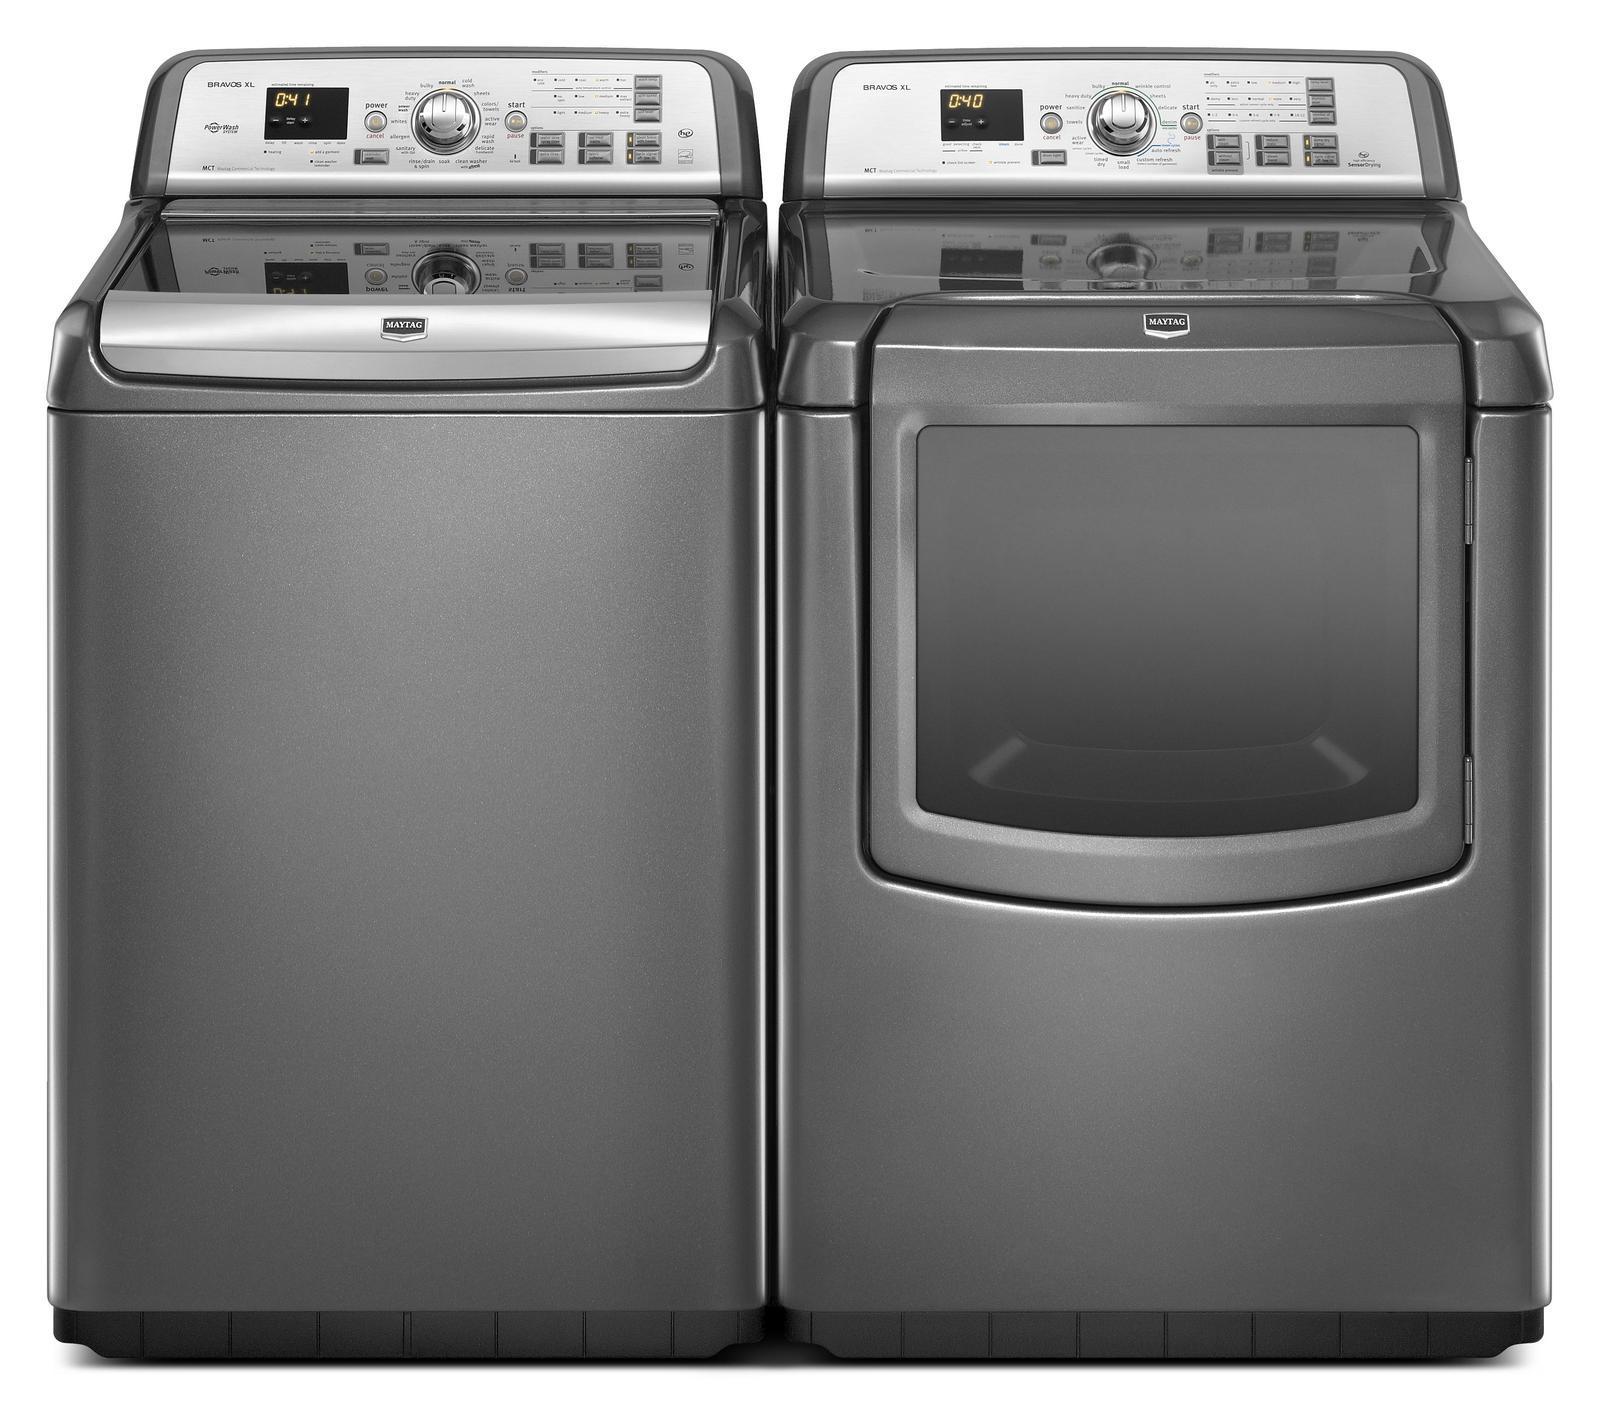 Mvwb950yg Maytag Mvwb950yg Bravos Series Top Load Washers